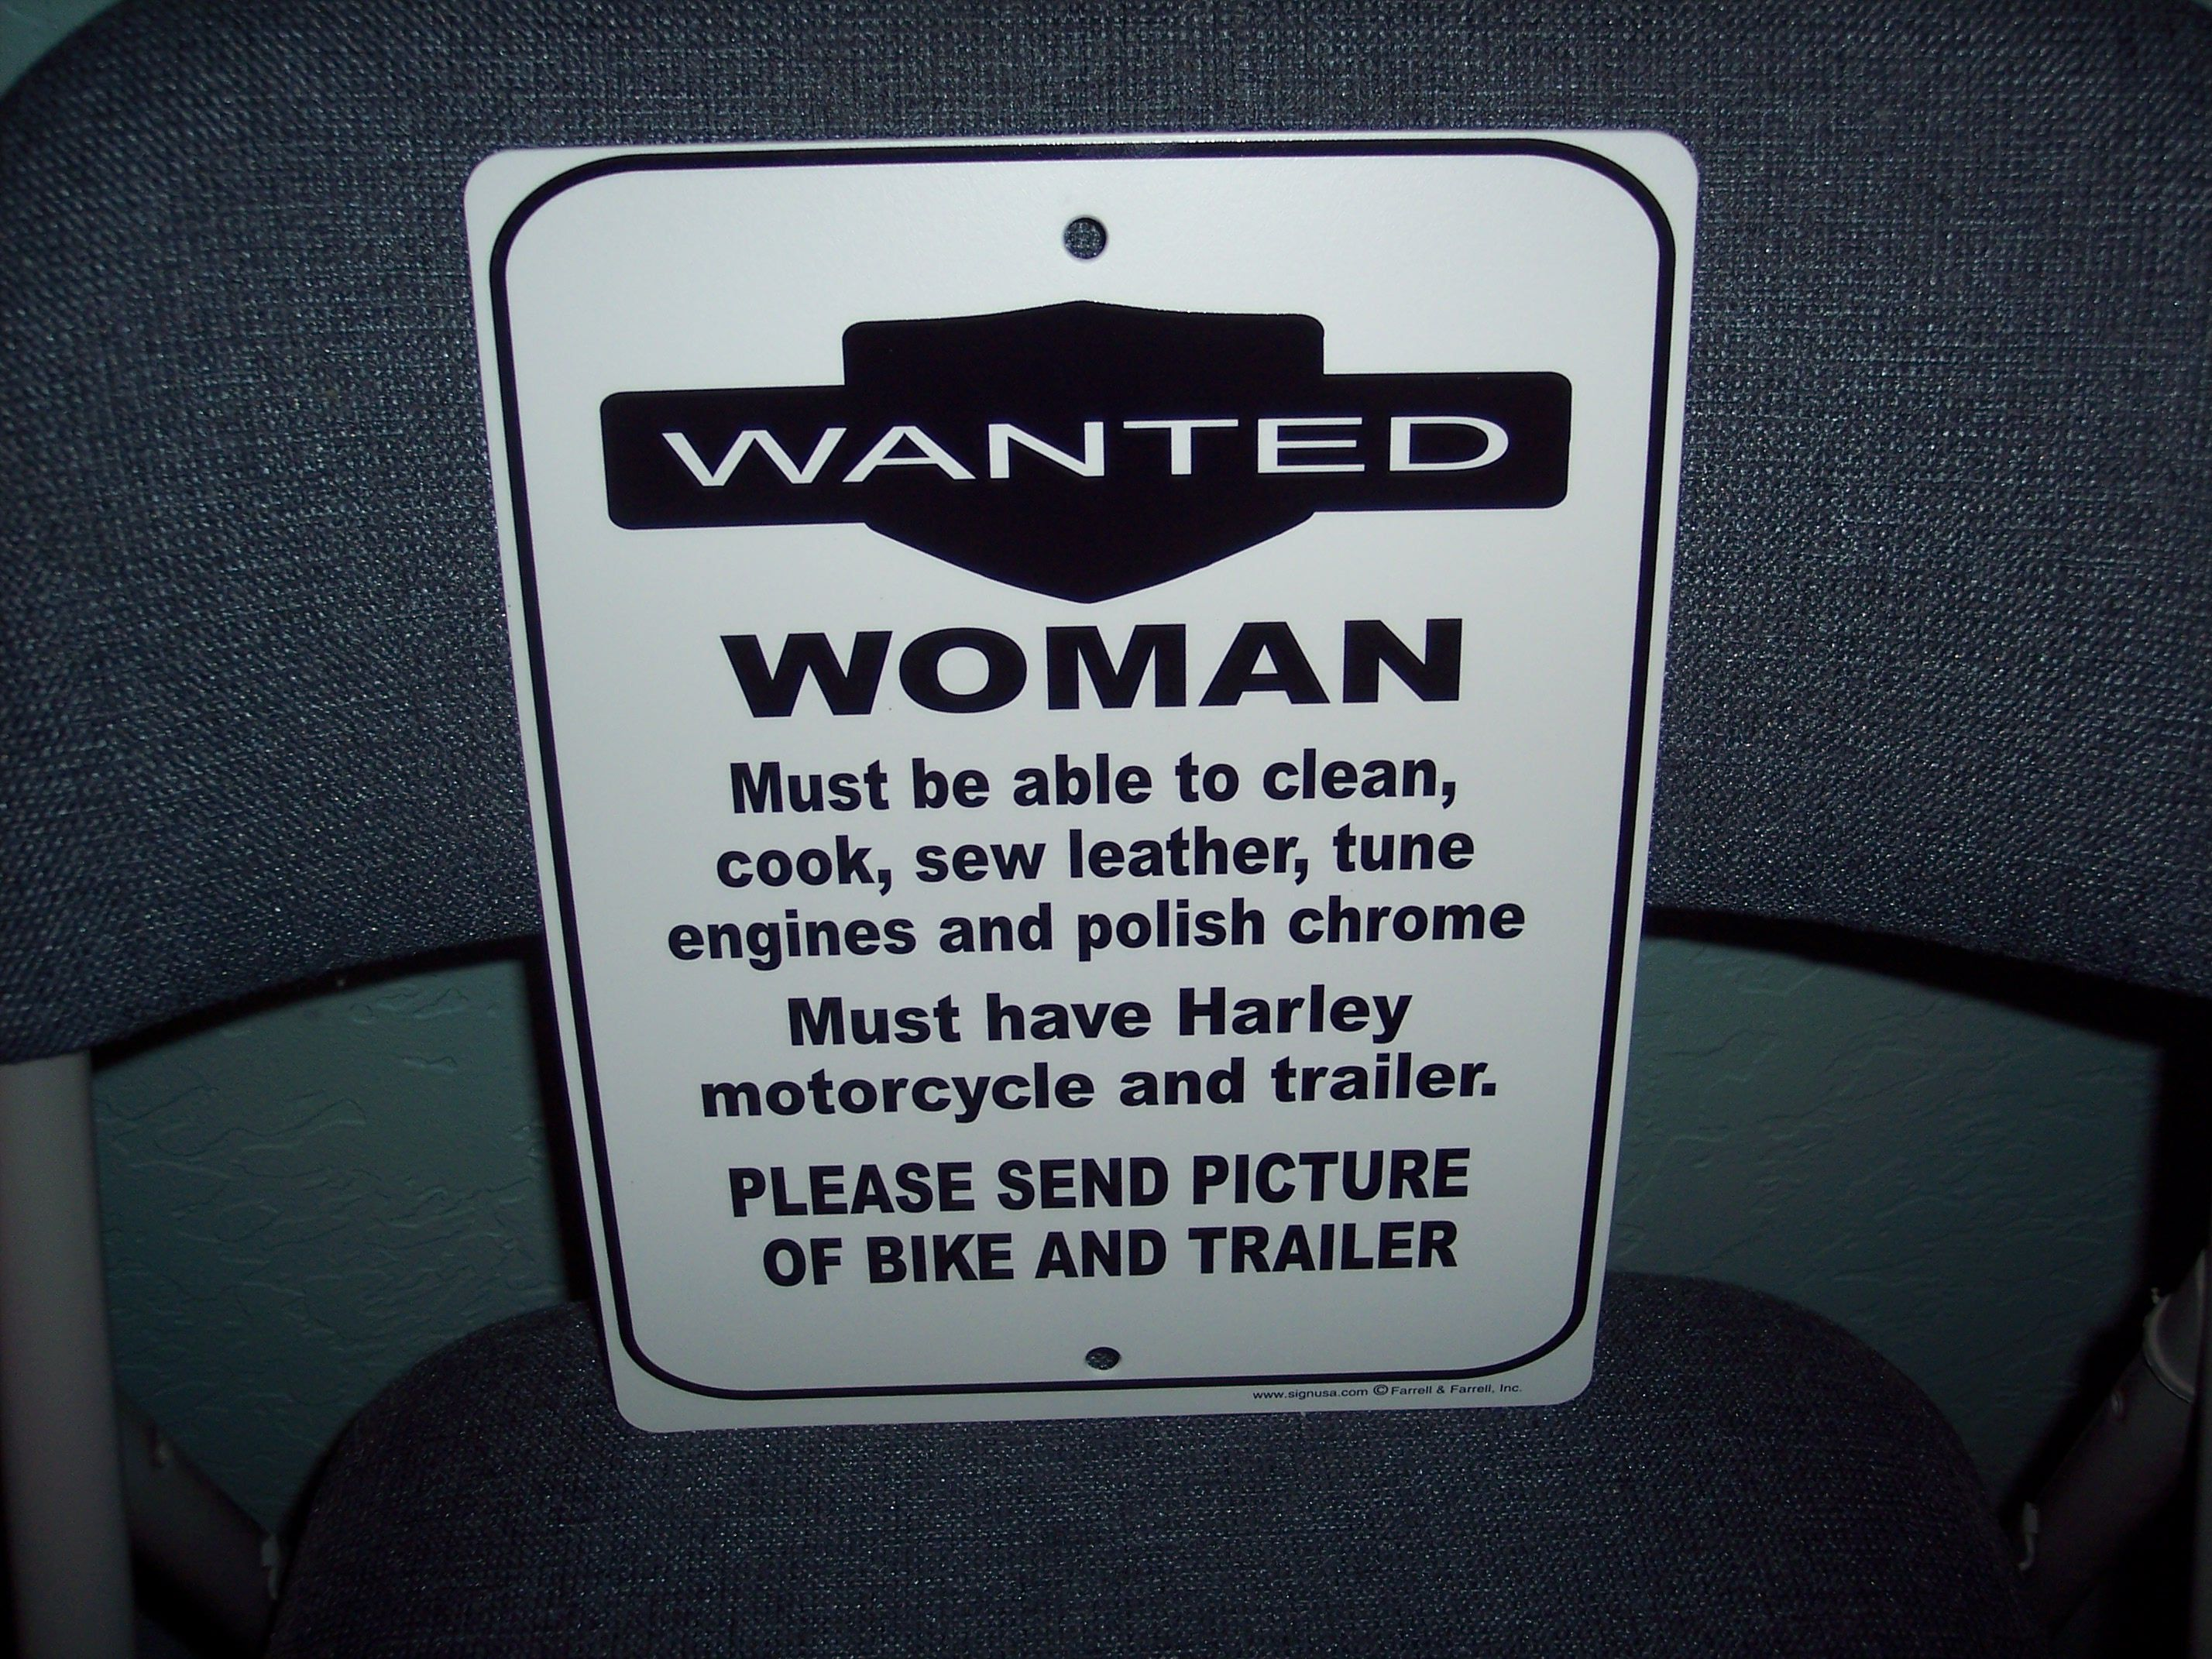 Harley Davidson Man Cave Signs : Wanted woman humor garage man cave restaurant harley